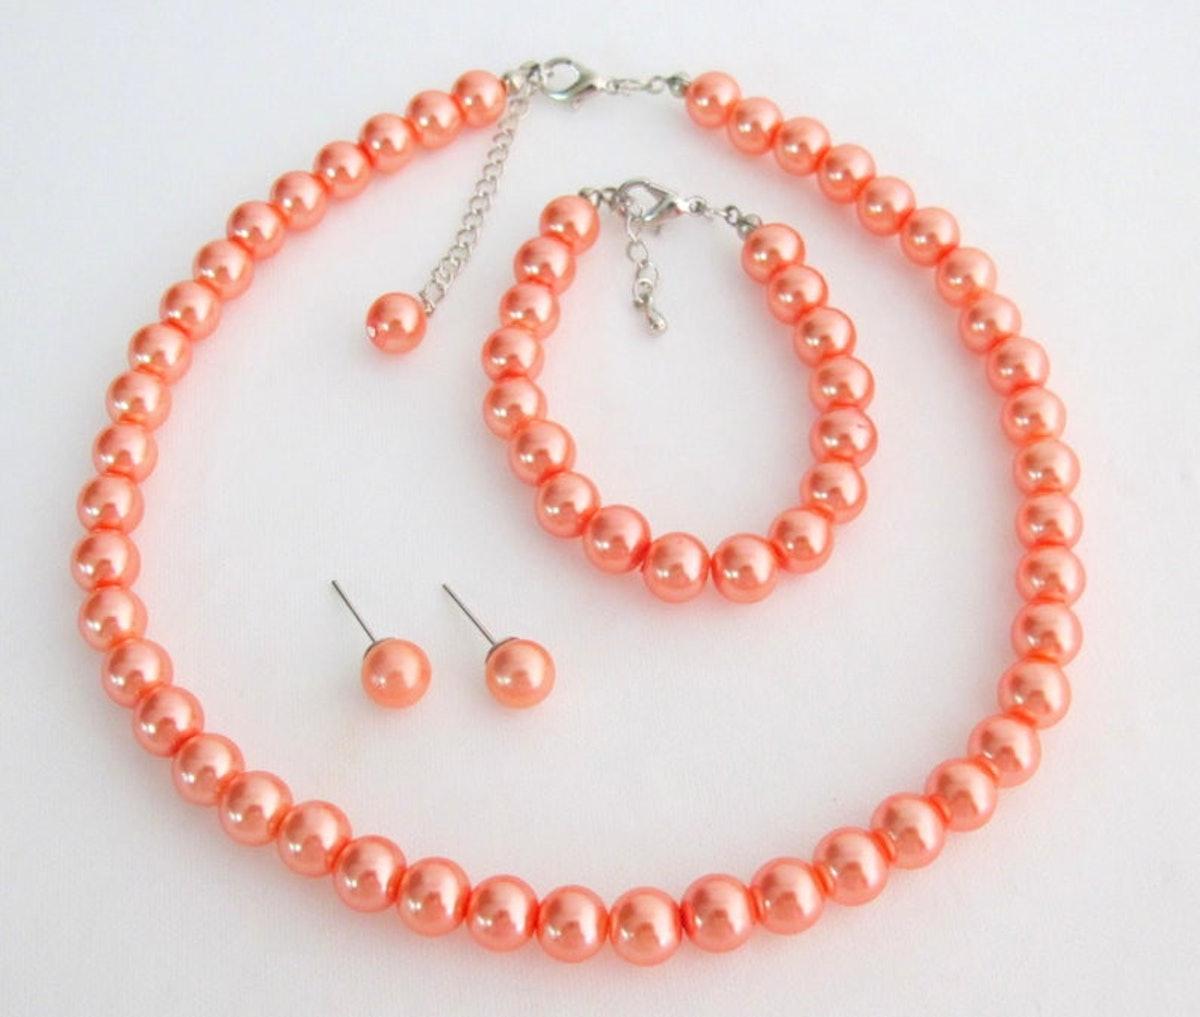 Orange Pearl Set Orange Pearl Necklace Orange Pearl Bracelet Orange Pearl Earrings Bridesmaid Free S...